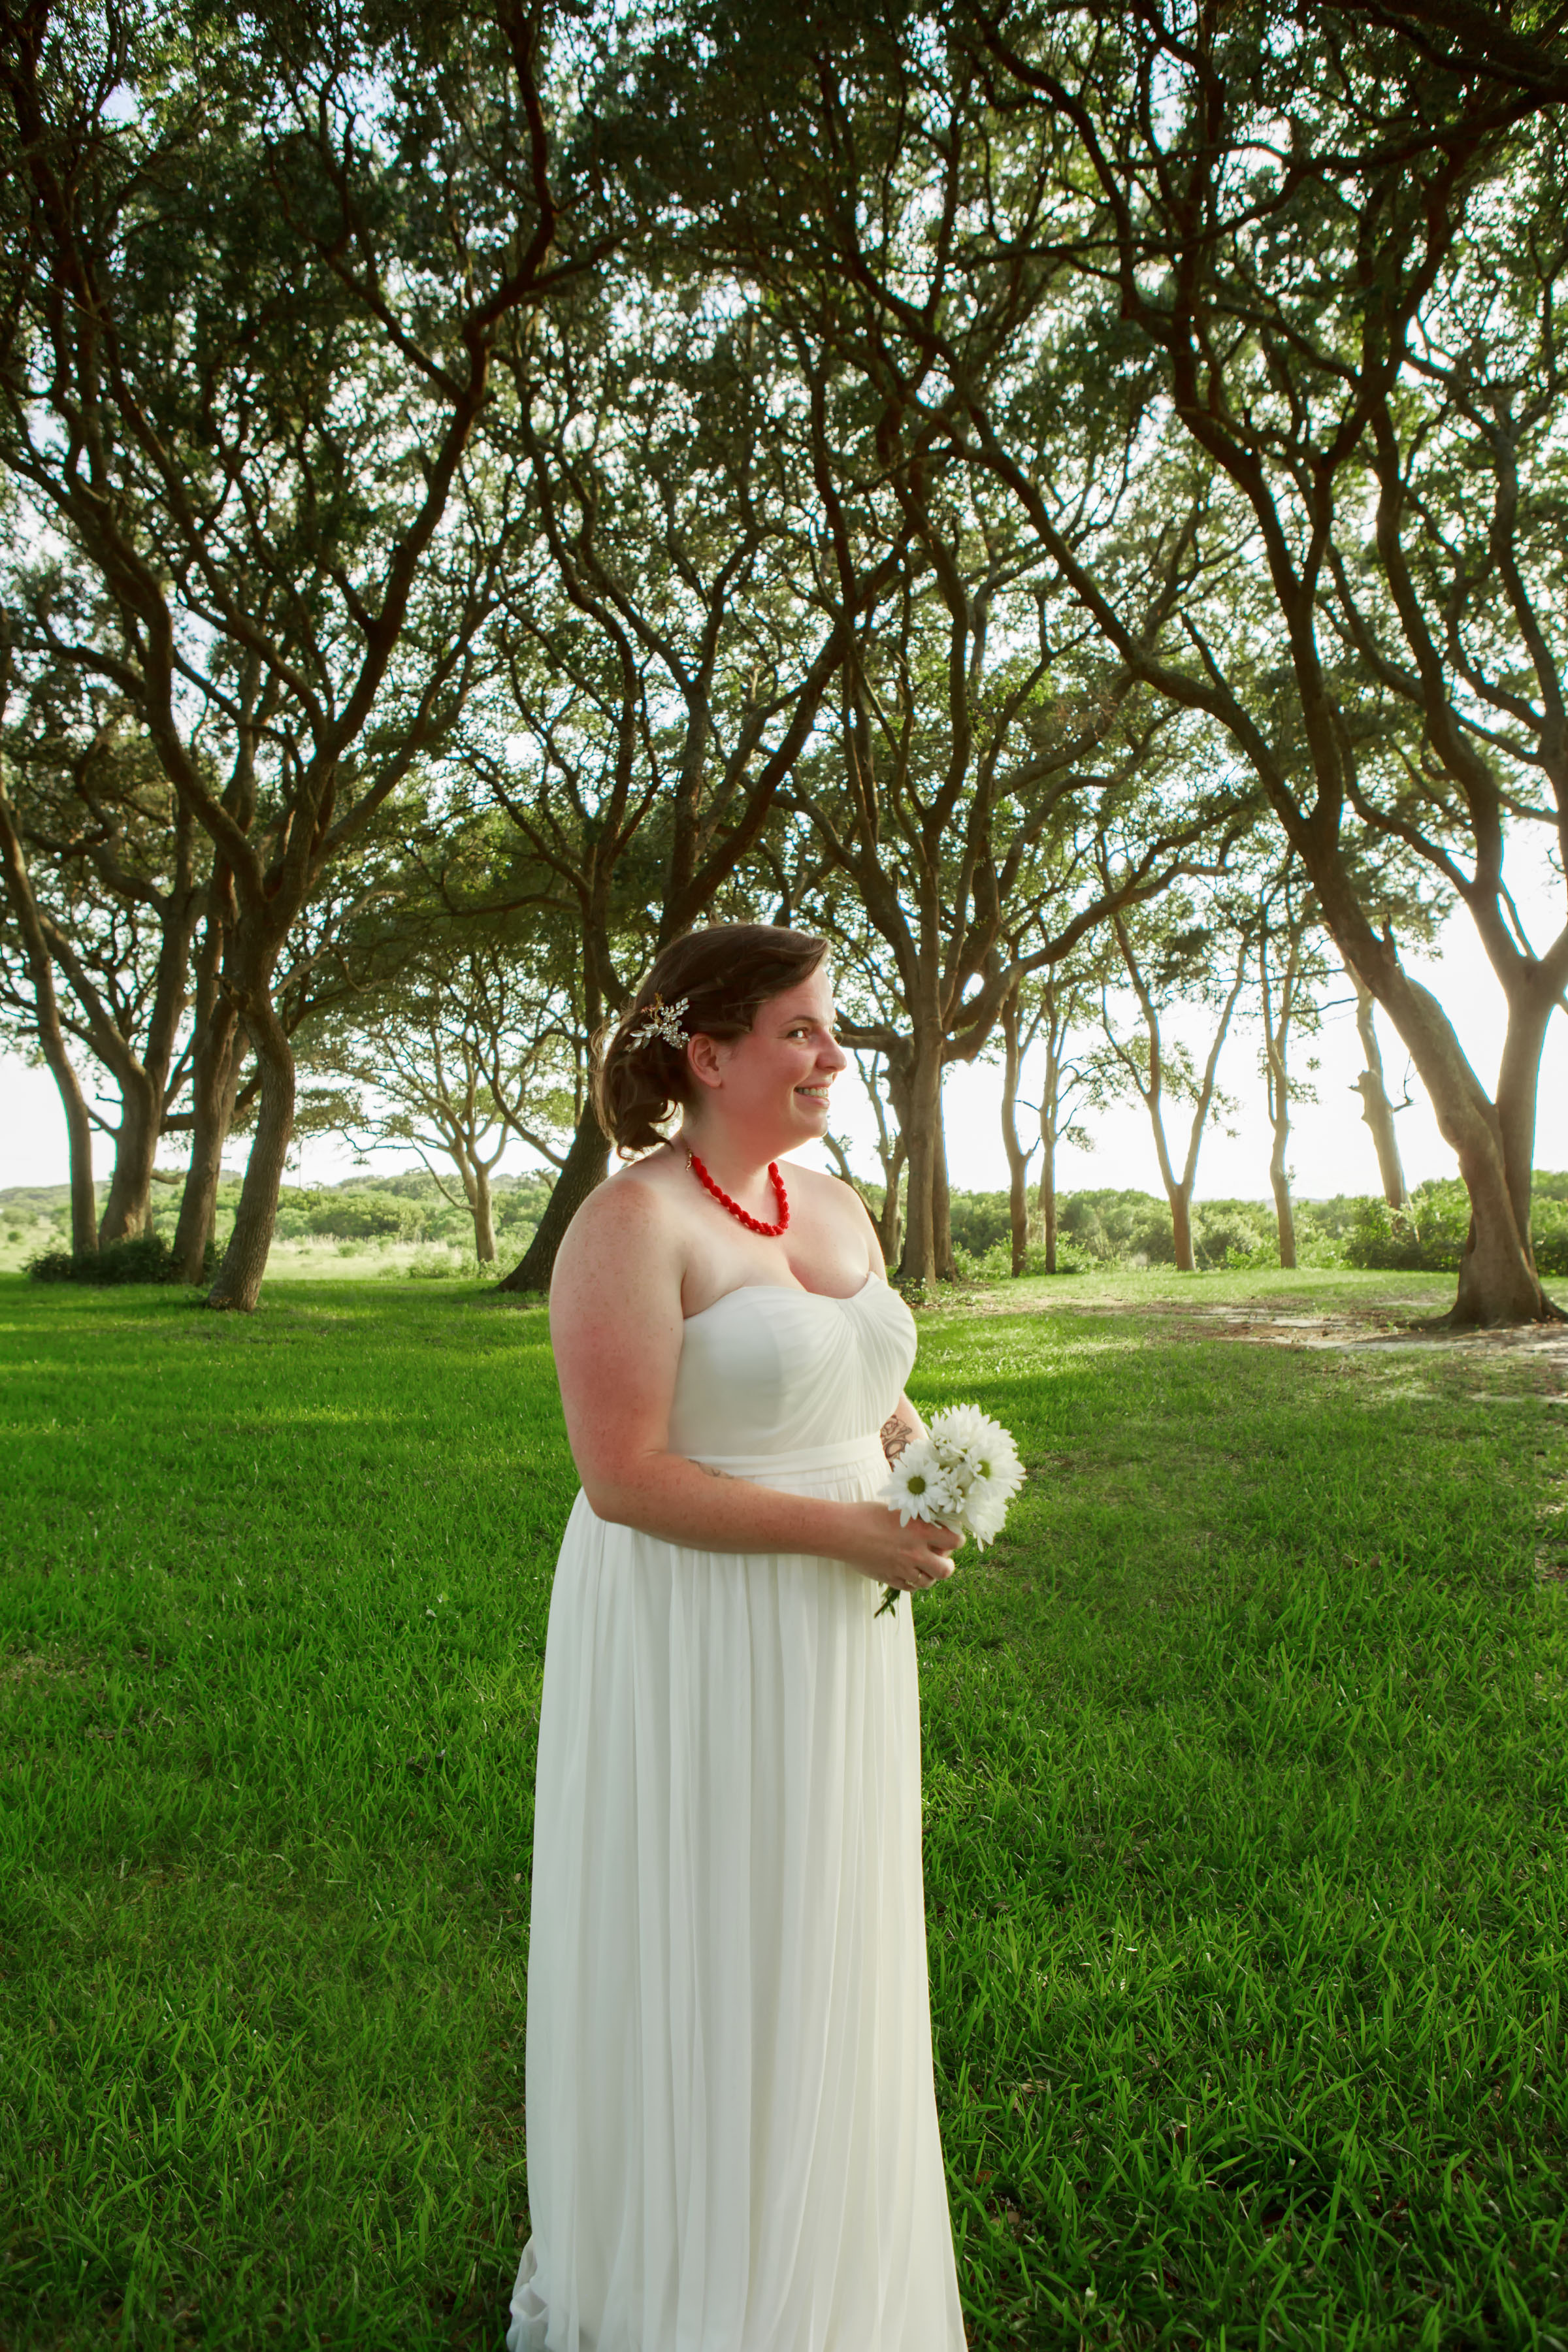 Fort_Fisher_Wedding_Photographer_Tiffany_Abruzzo_8.jpg